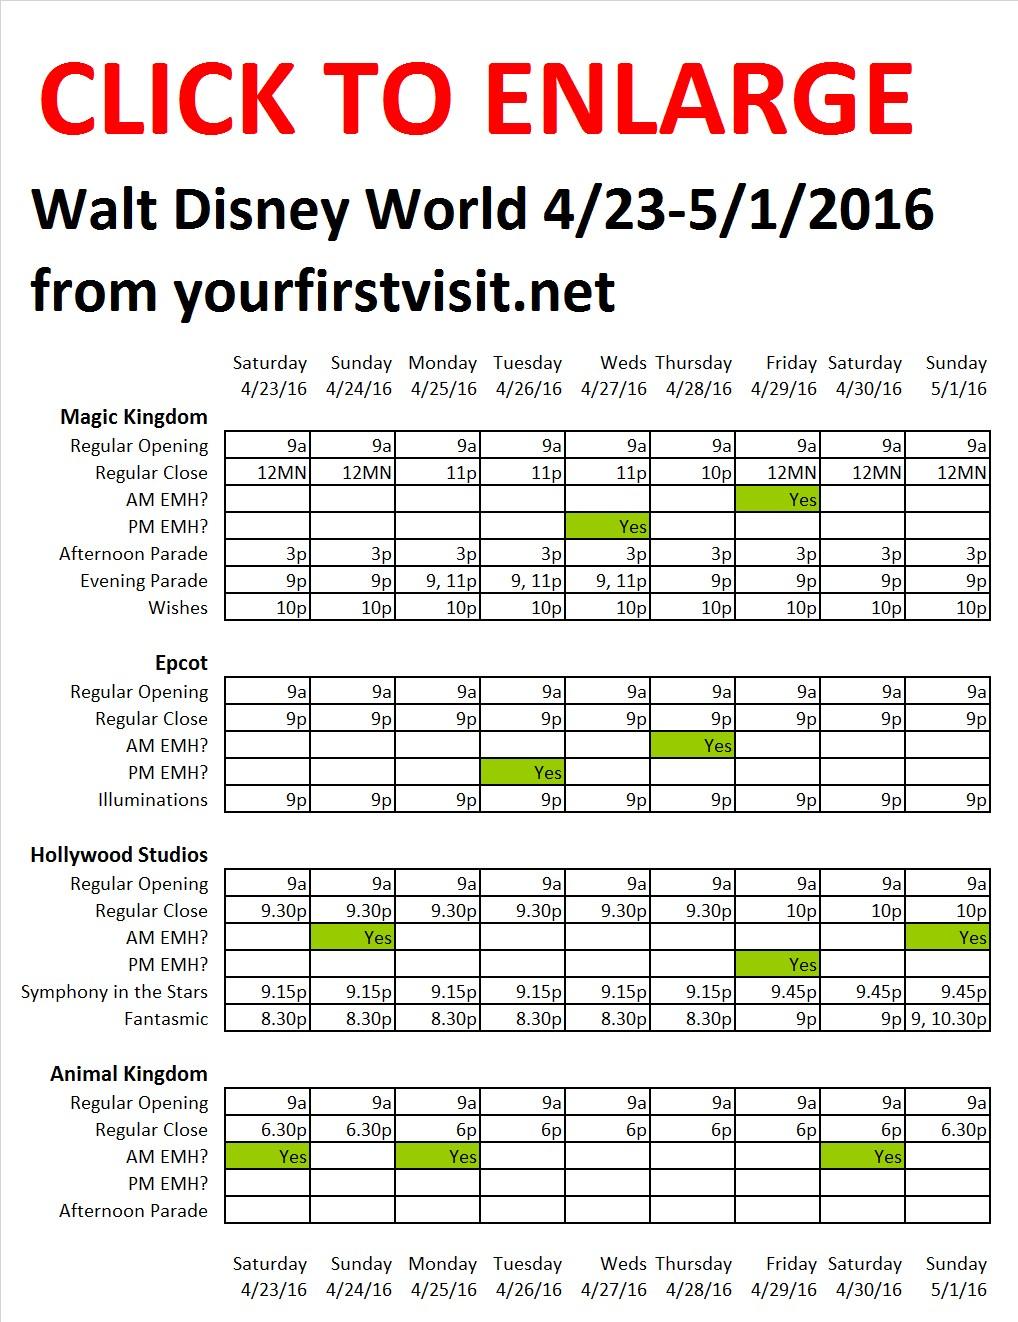 Disney World 4-23 to 5-1-2016 from yourfirstvisit.net